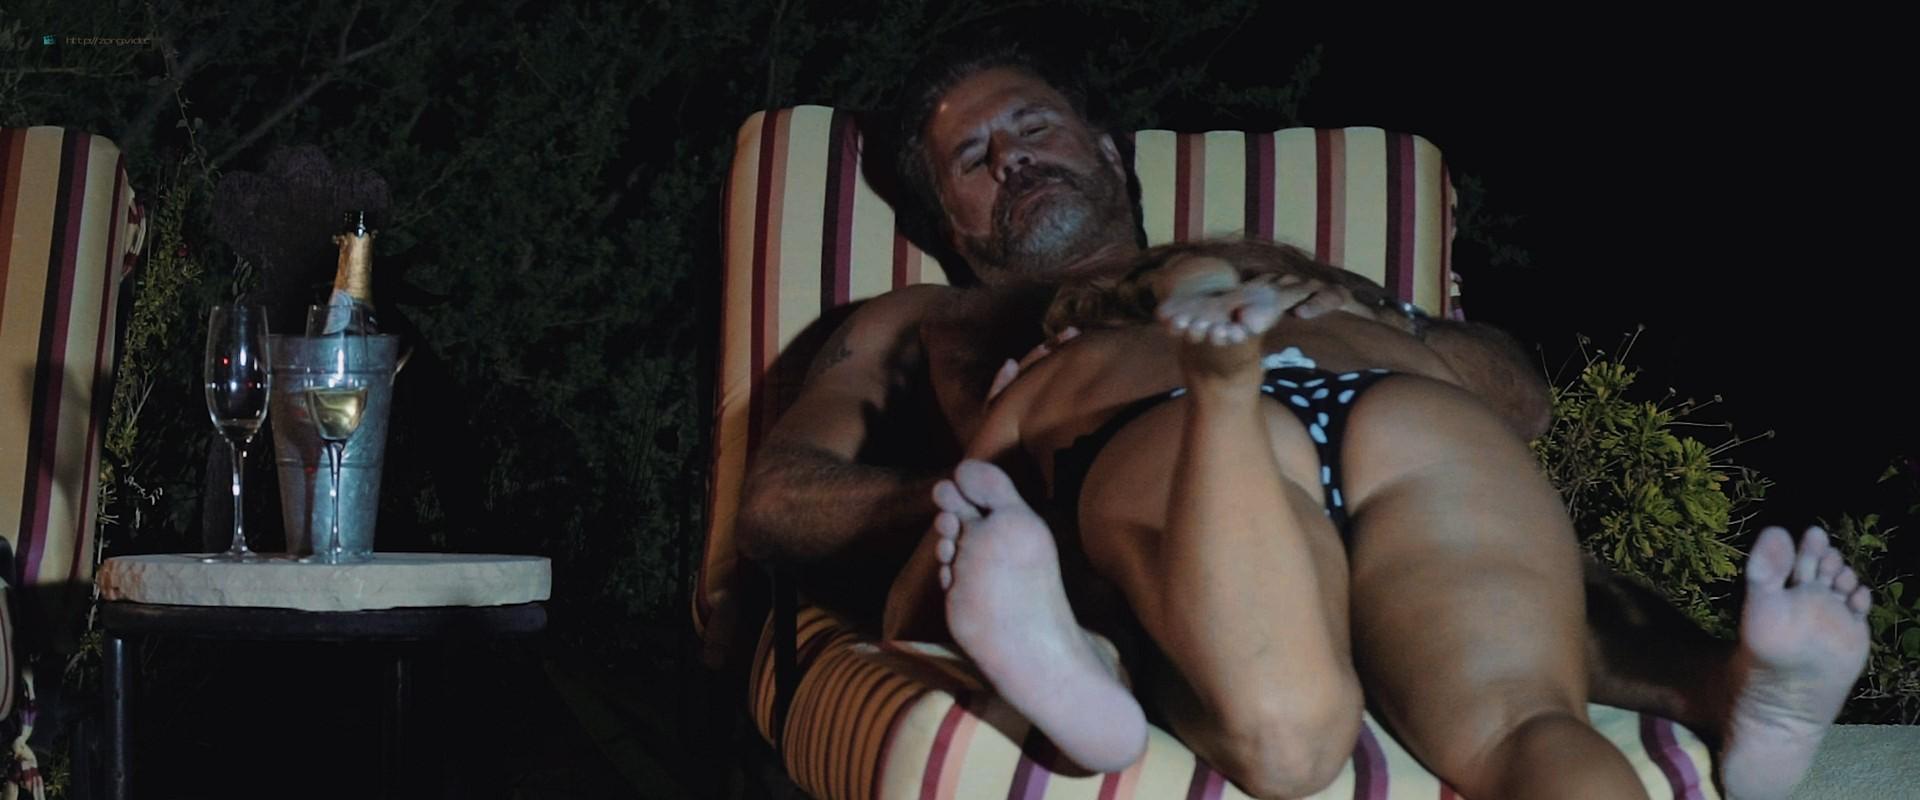 Audrey Beth nude topless Kier Simonetta, Michelle Miller nude too - Water (2019) 1080p (8)